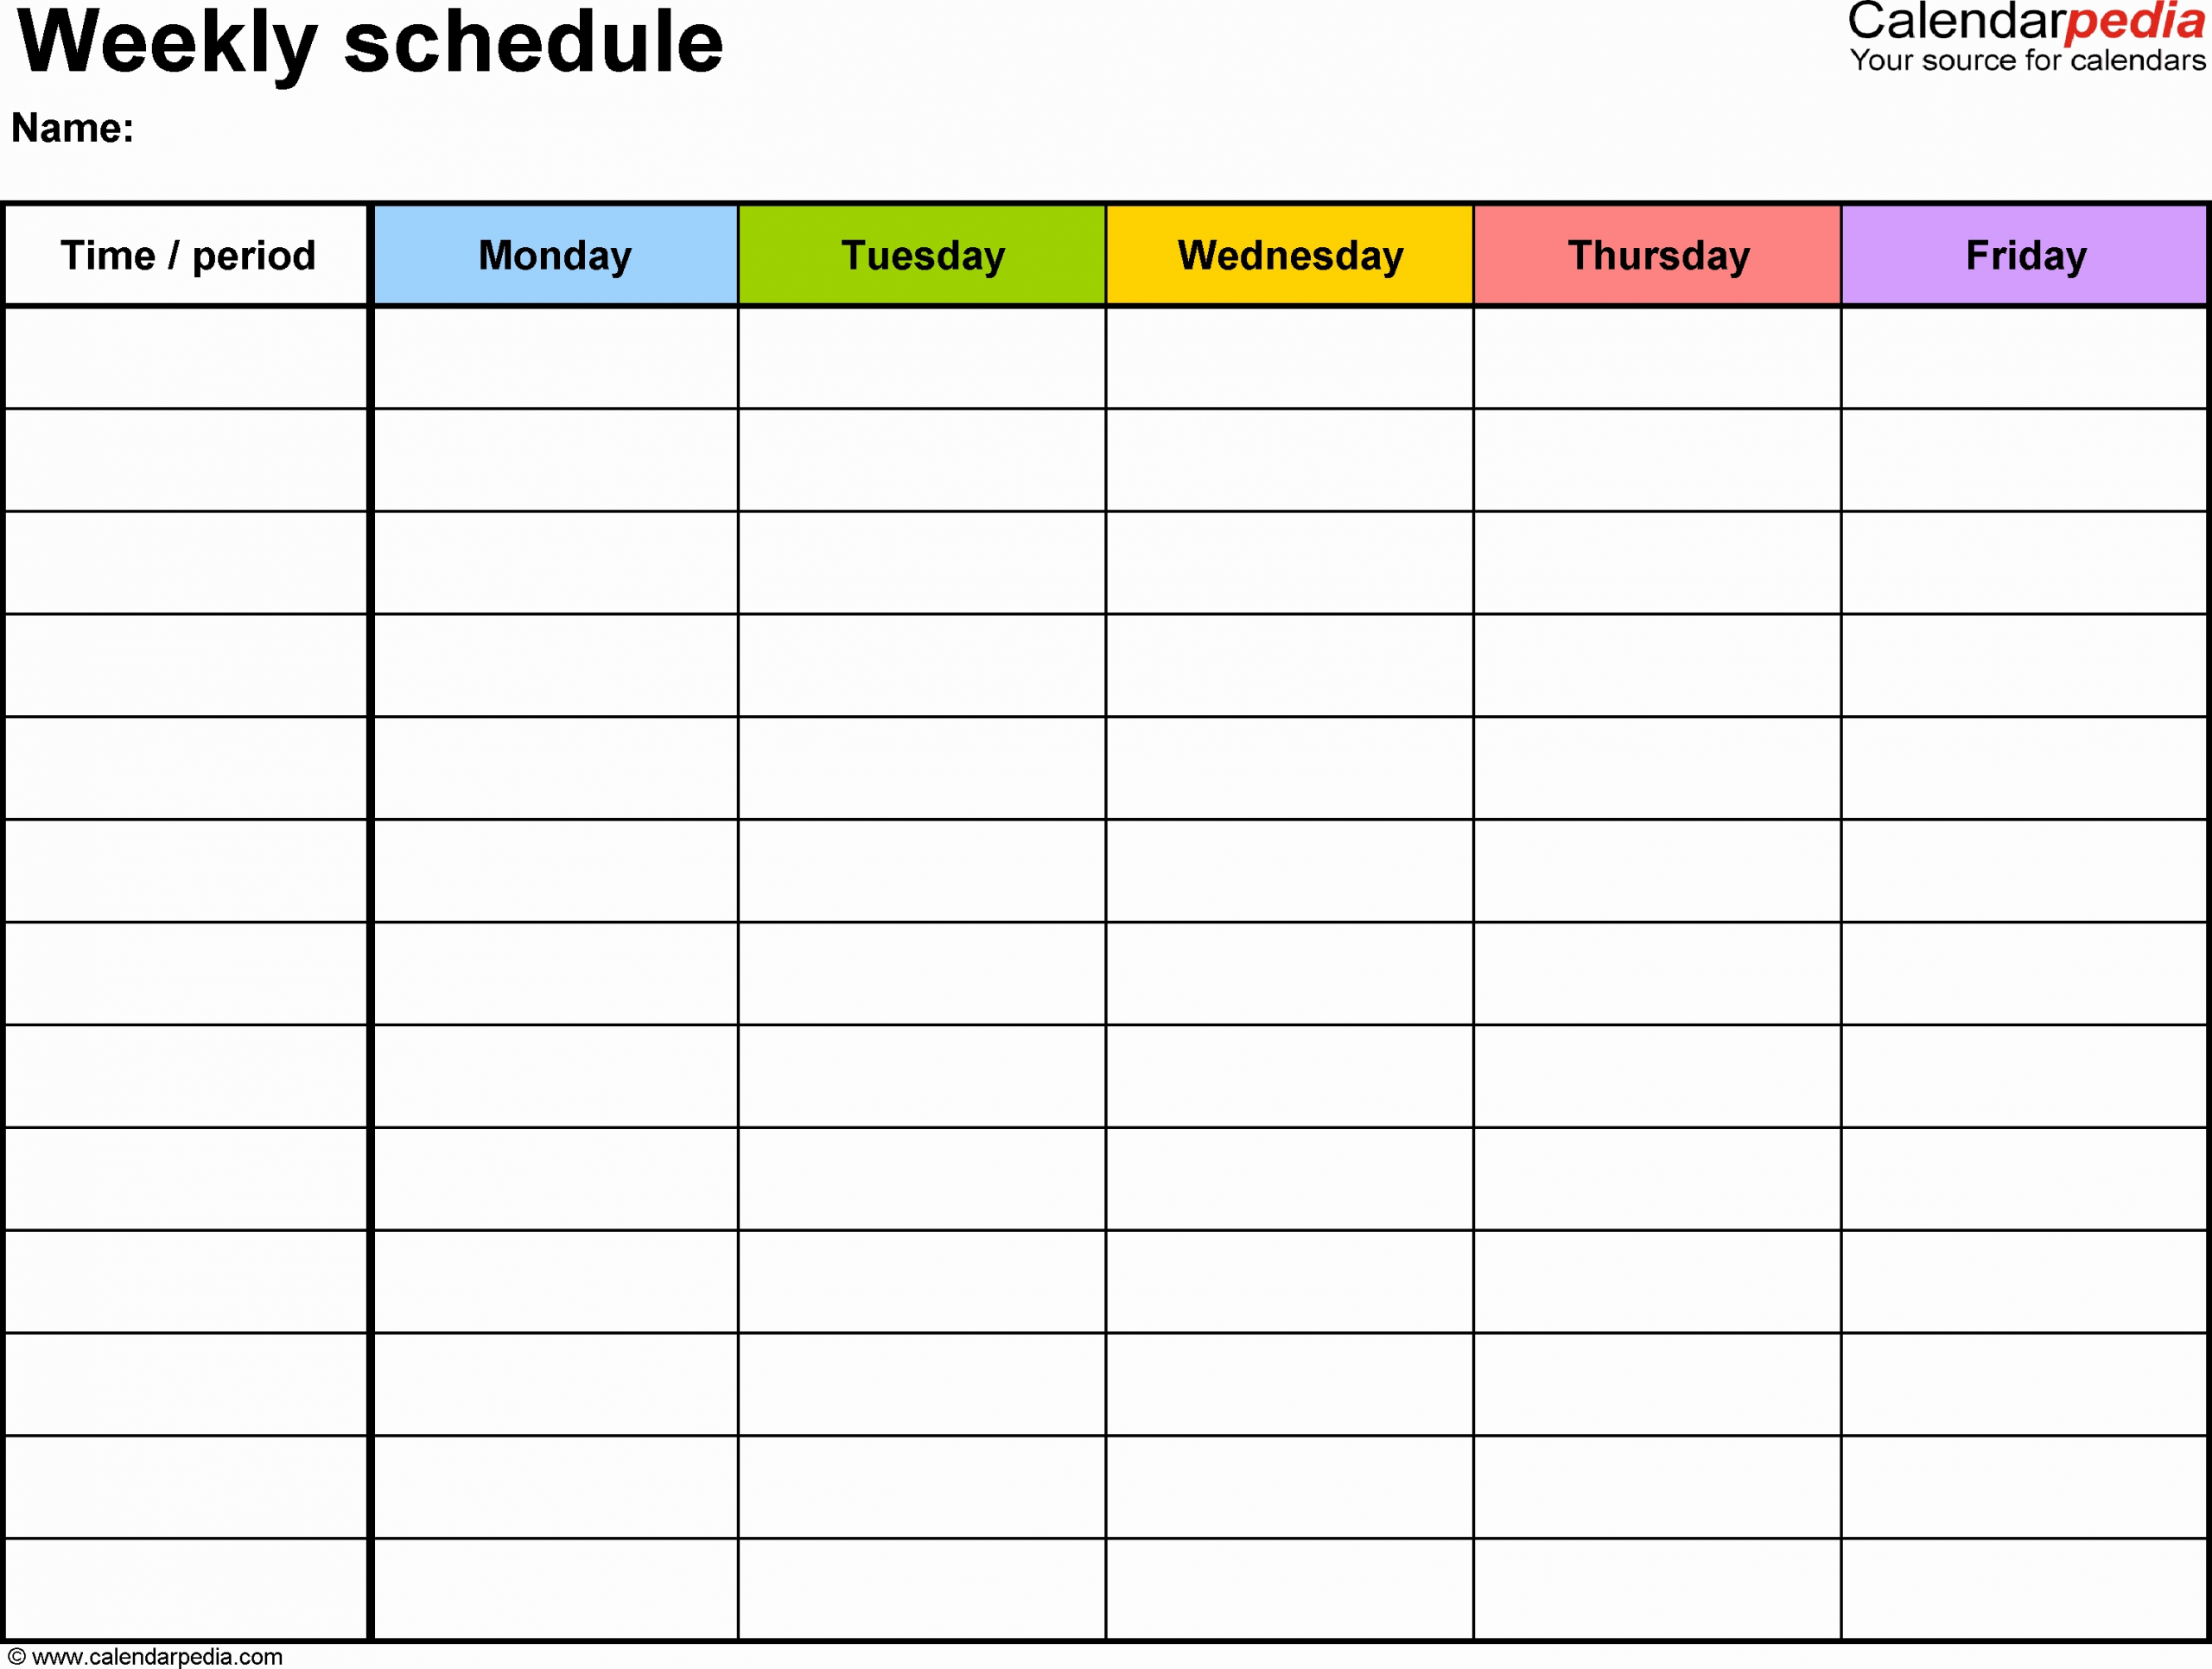 Depo Provera Calendar 2020 Does It Change   Calendar Depo Provera Due Date Calendar